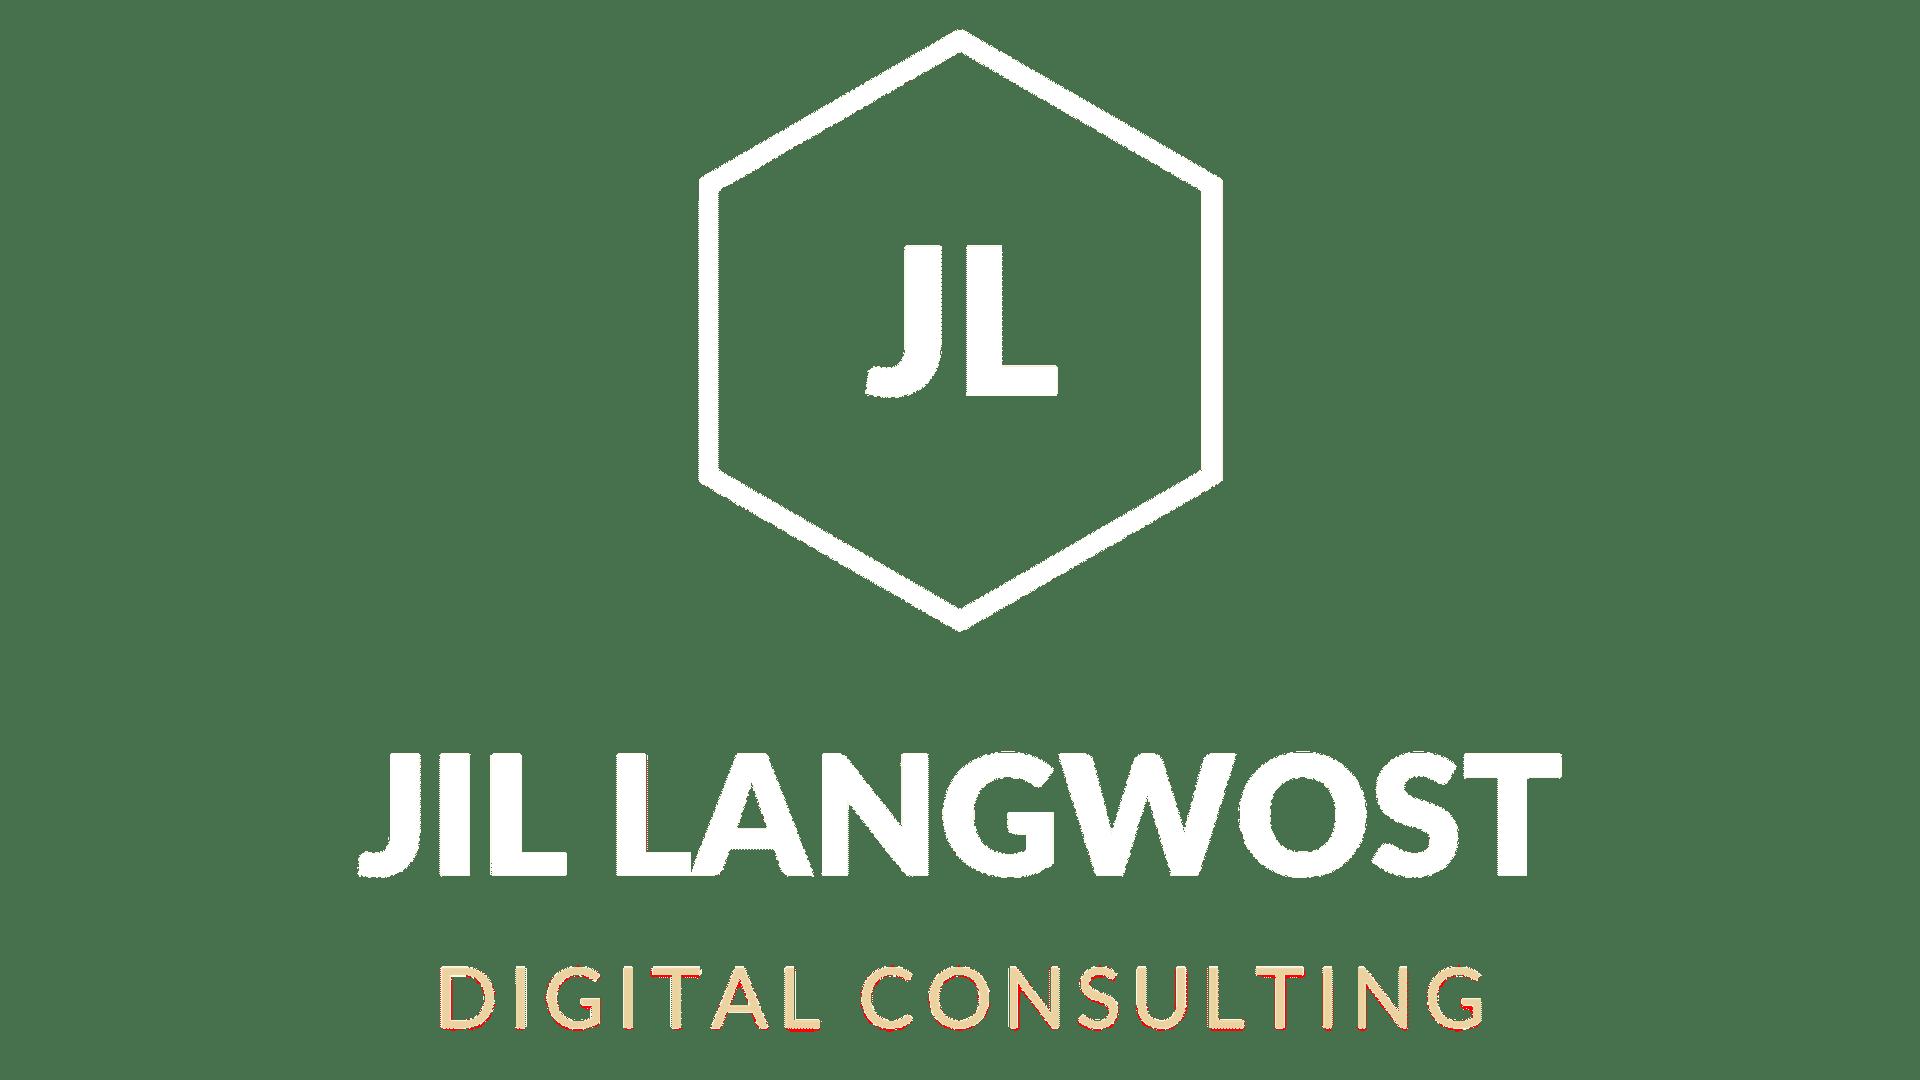 JIL LANGWOST